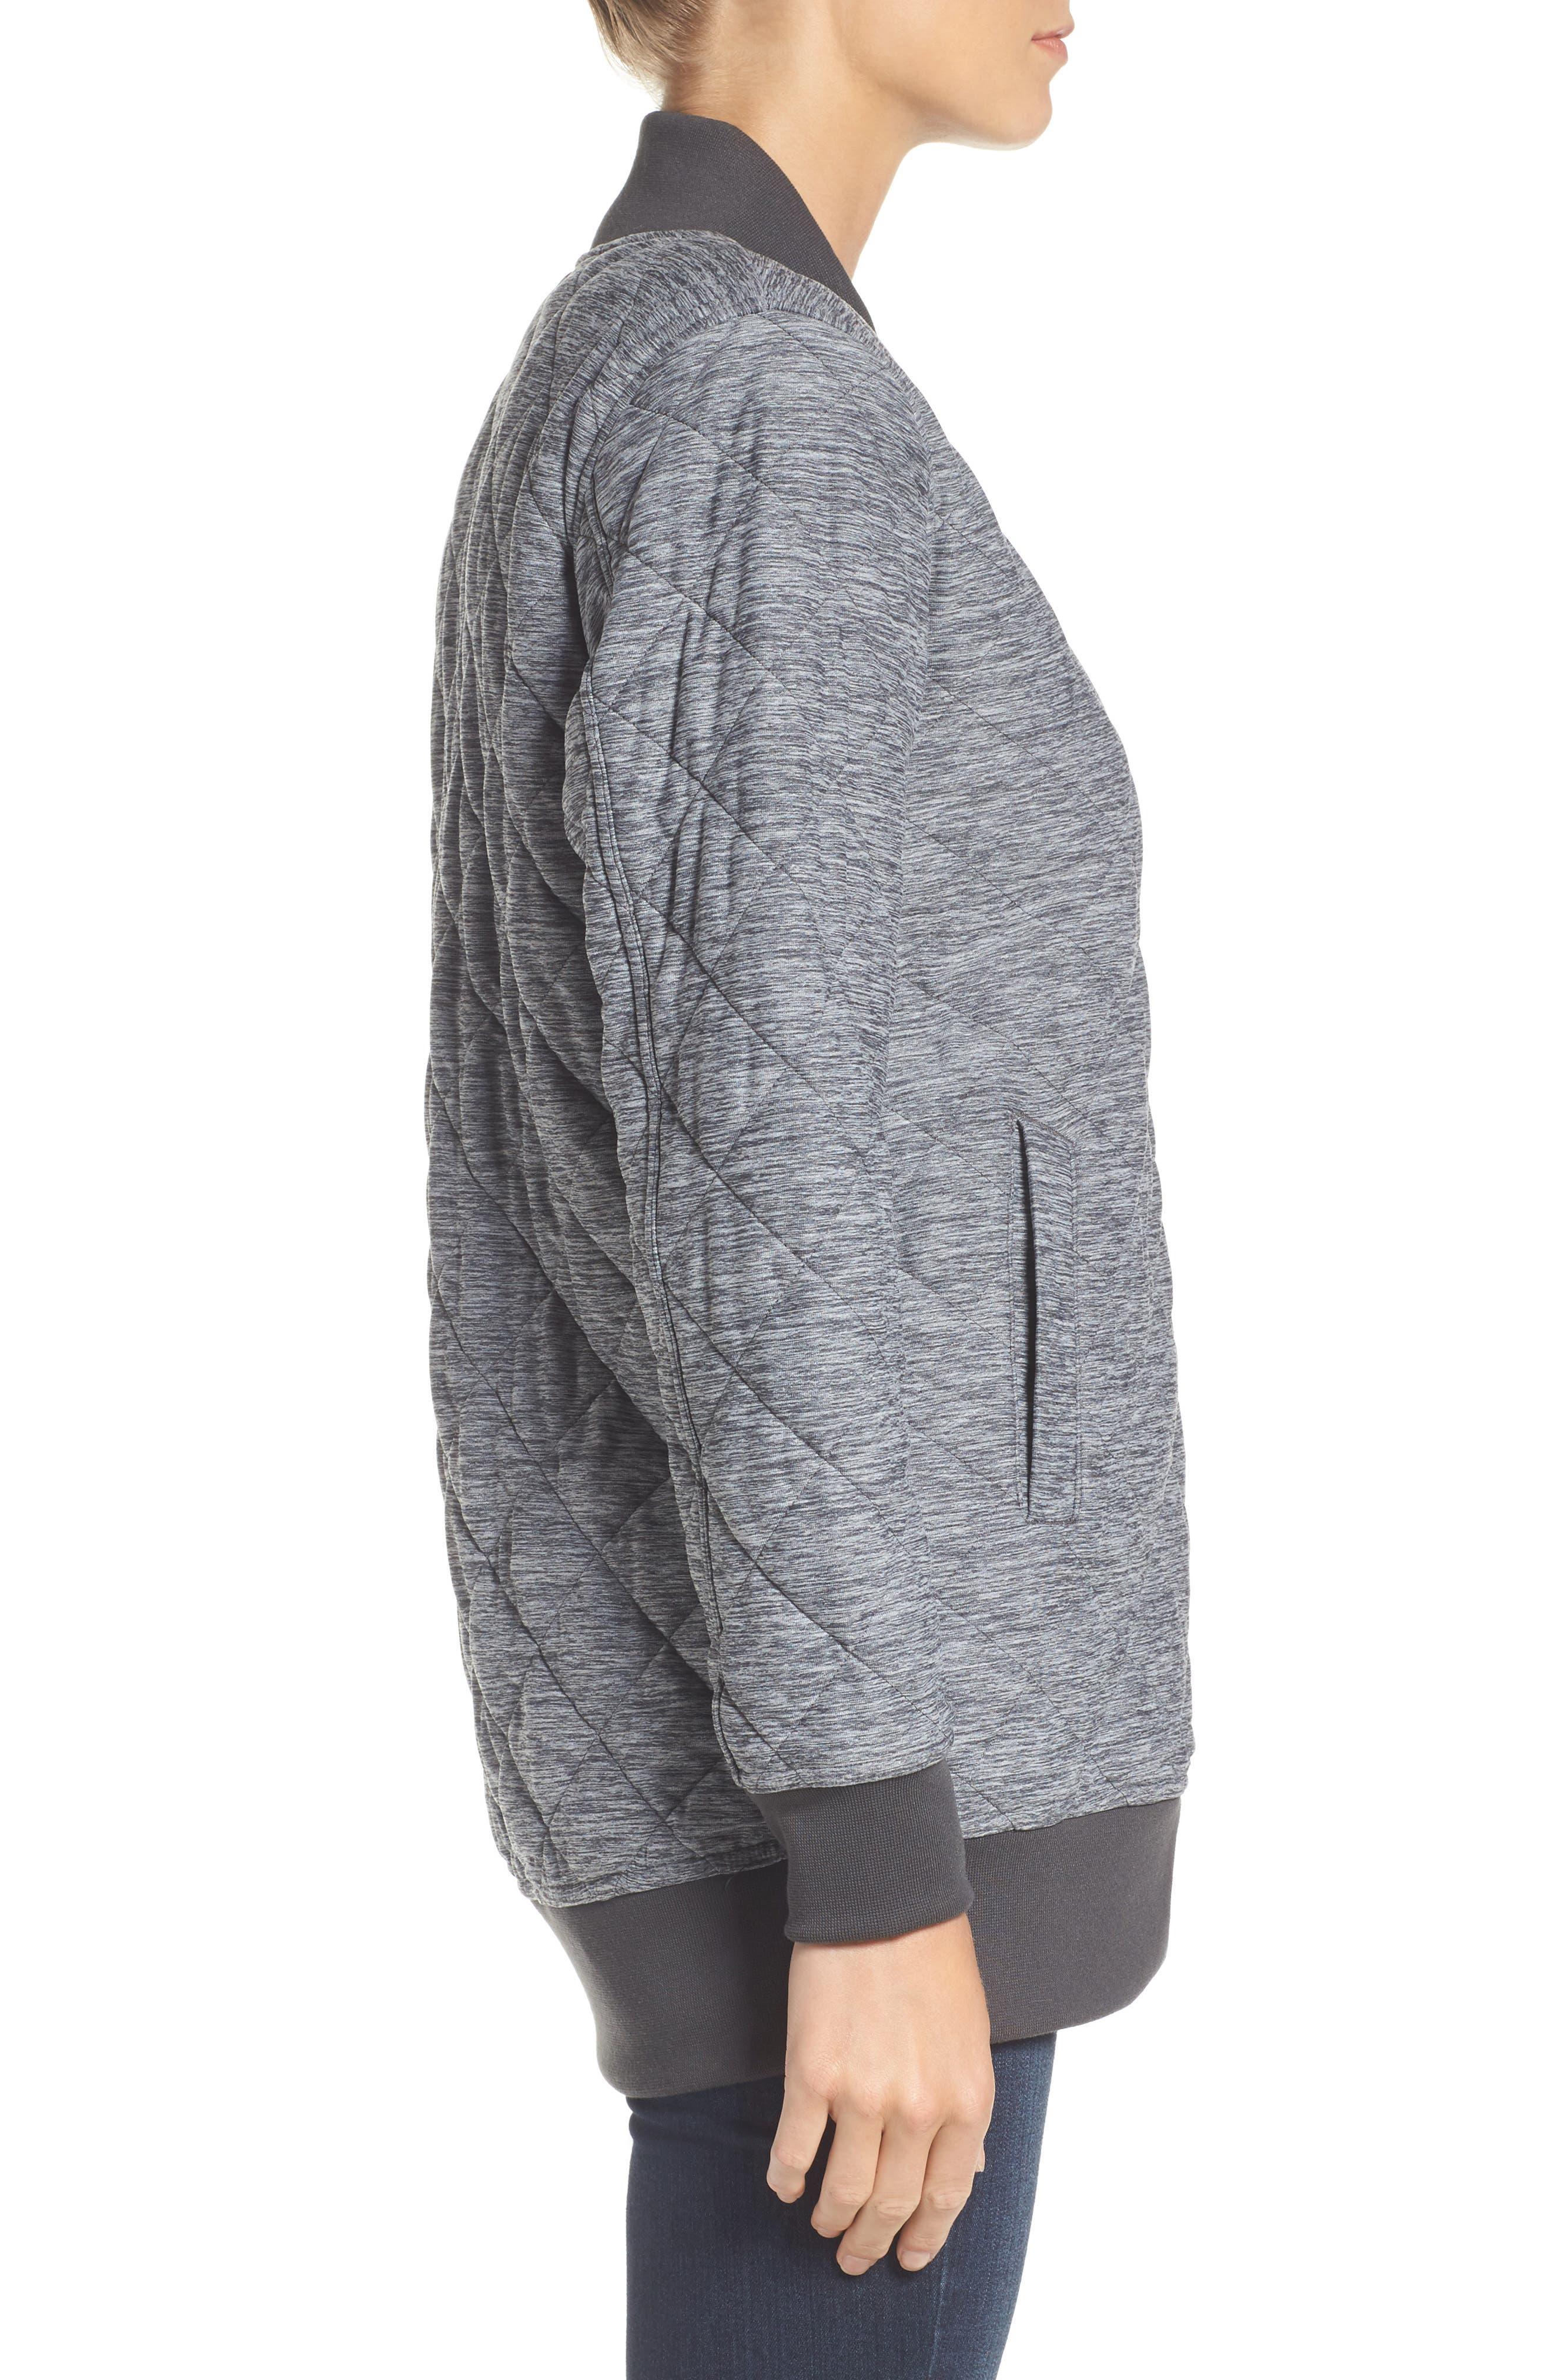 Mod Insulated Knit Jacket,                             Alternate thumbnail 4, color,                             Tnf Dark Grey Heather